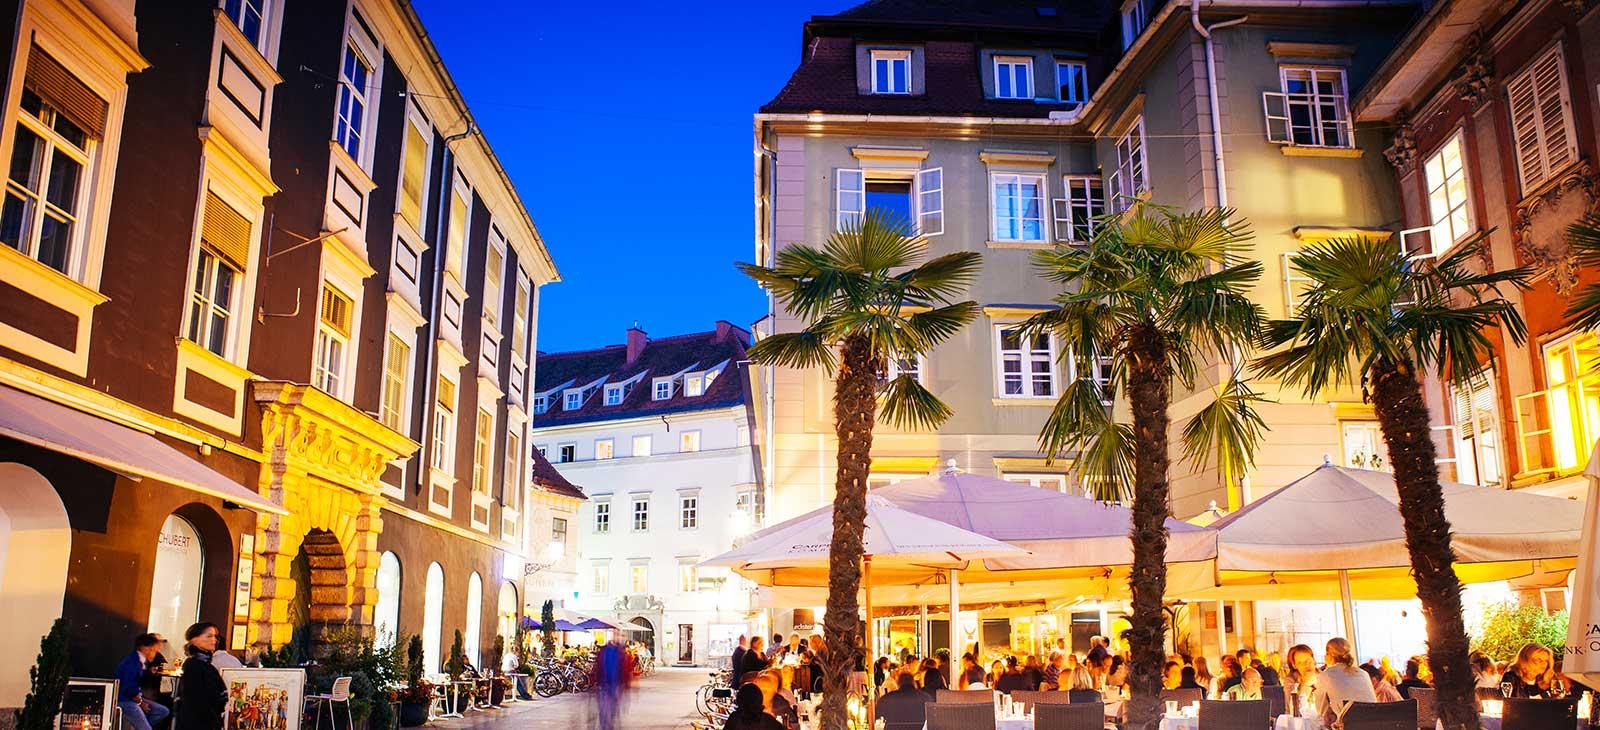 Restaurant & Bar Eckstein Graz